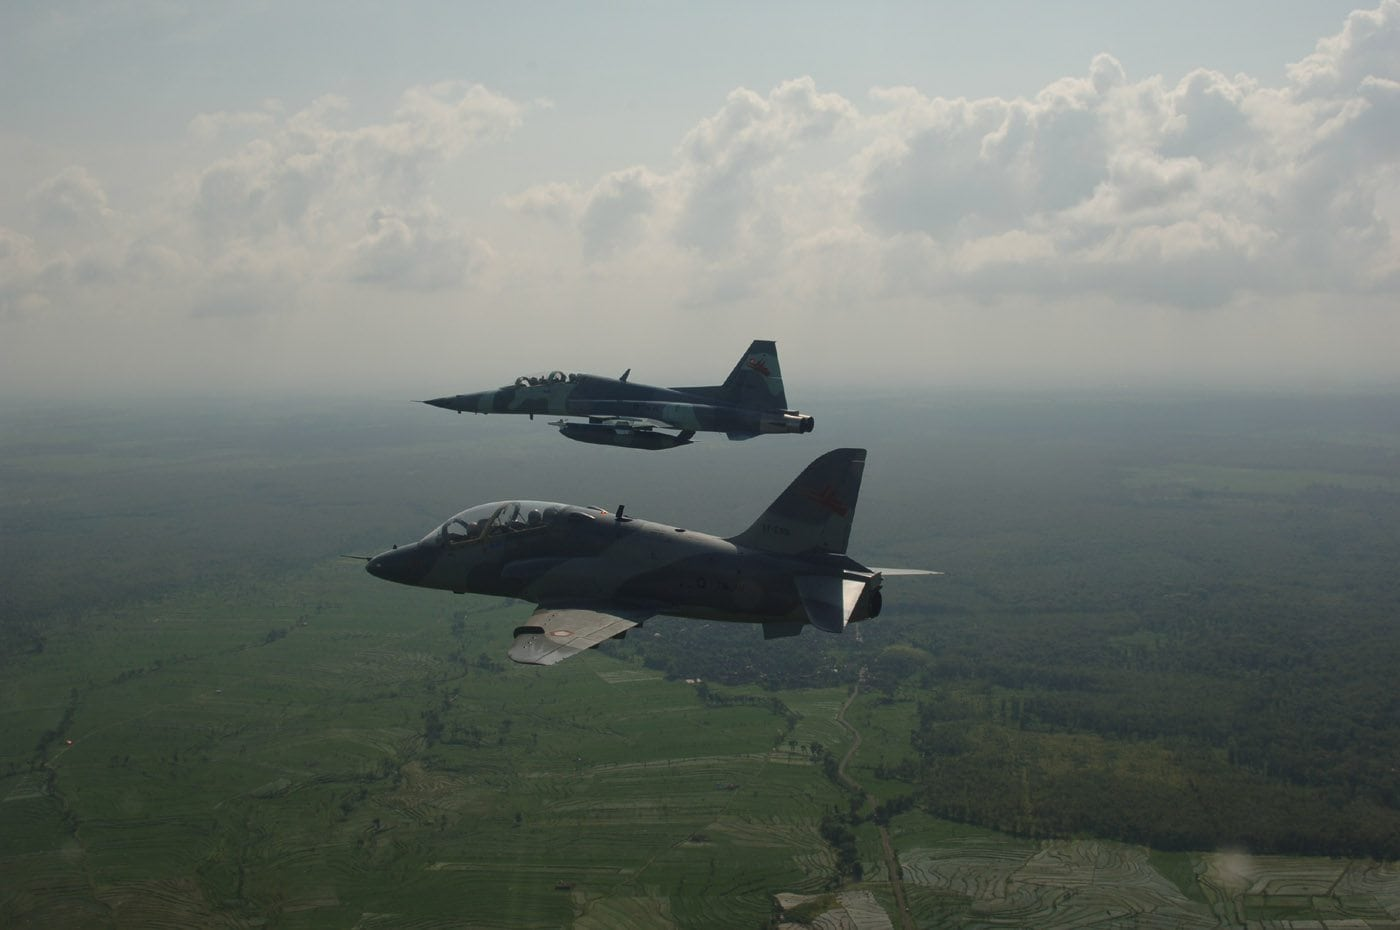 BAe Hawk 209